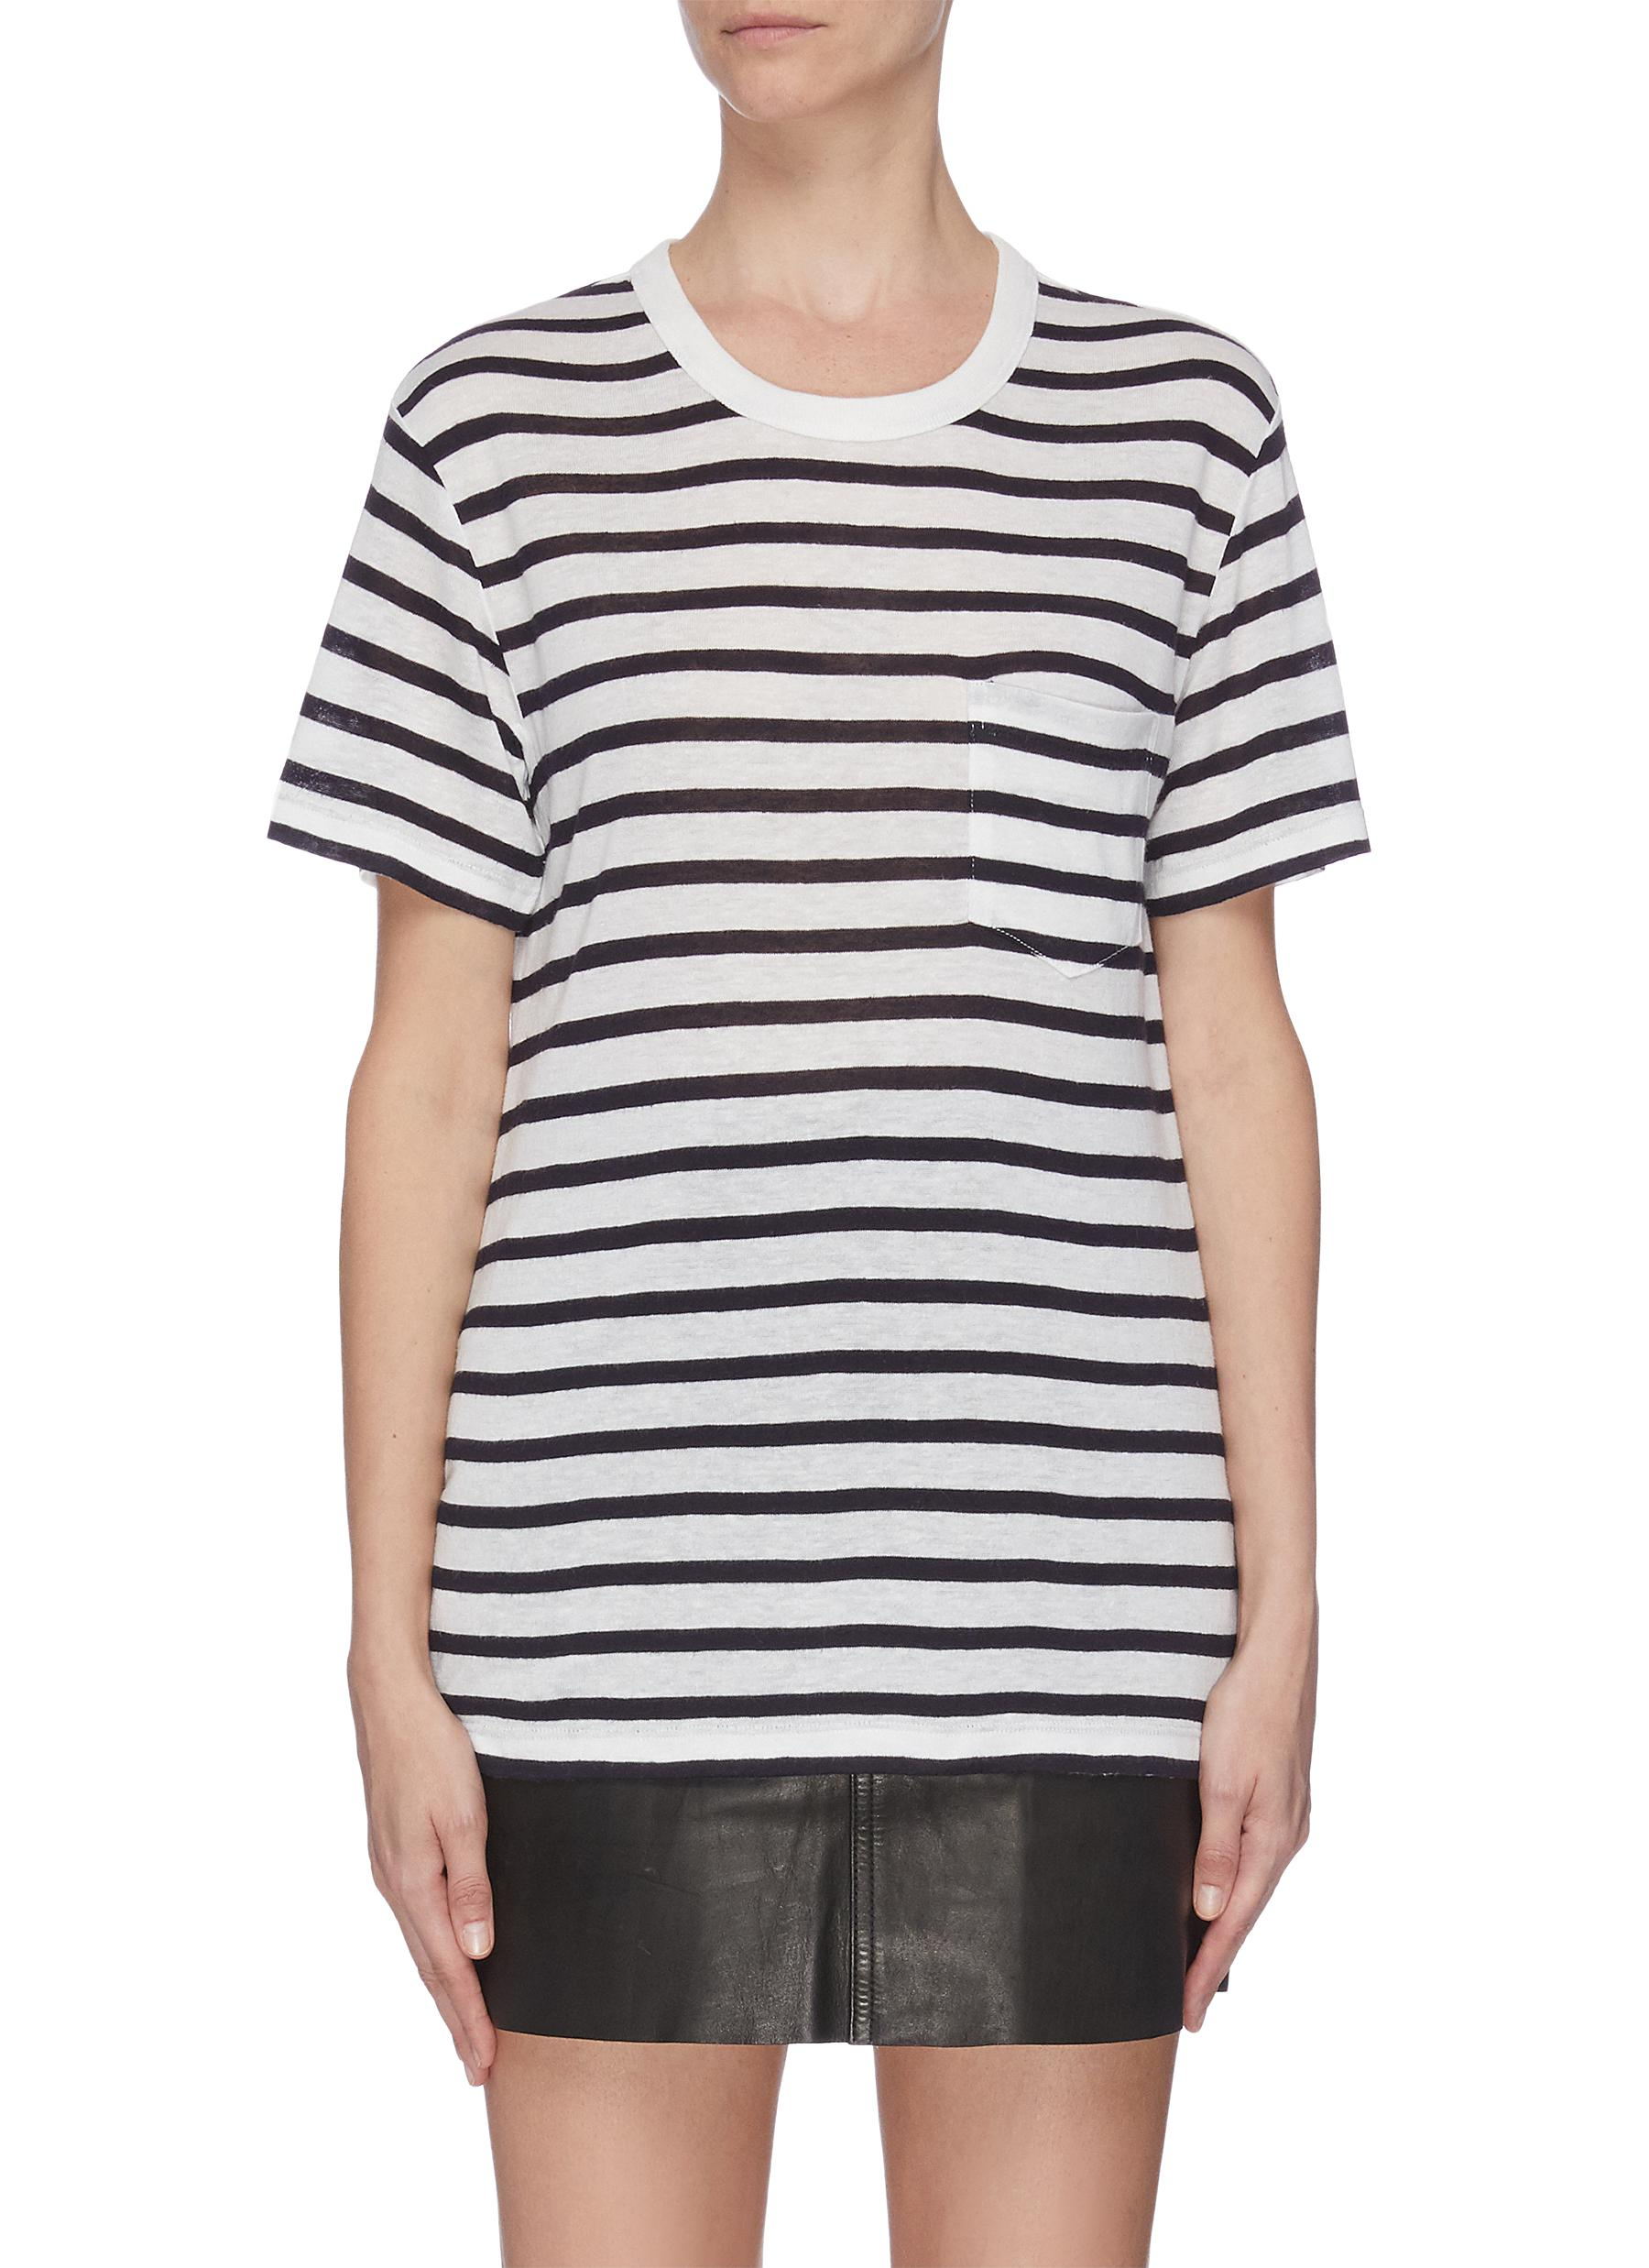 Buy Alexanderwang.T Tops Striped chest pocket T-shirt